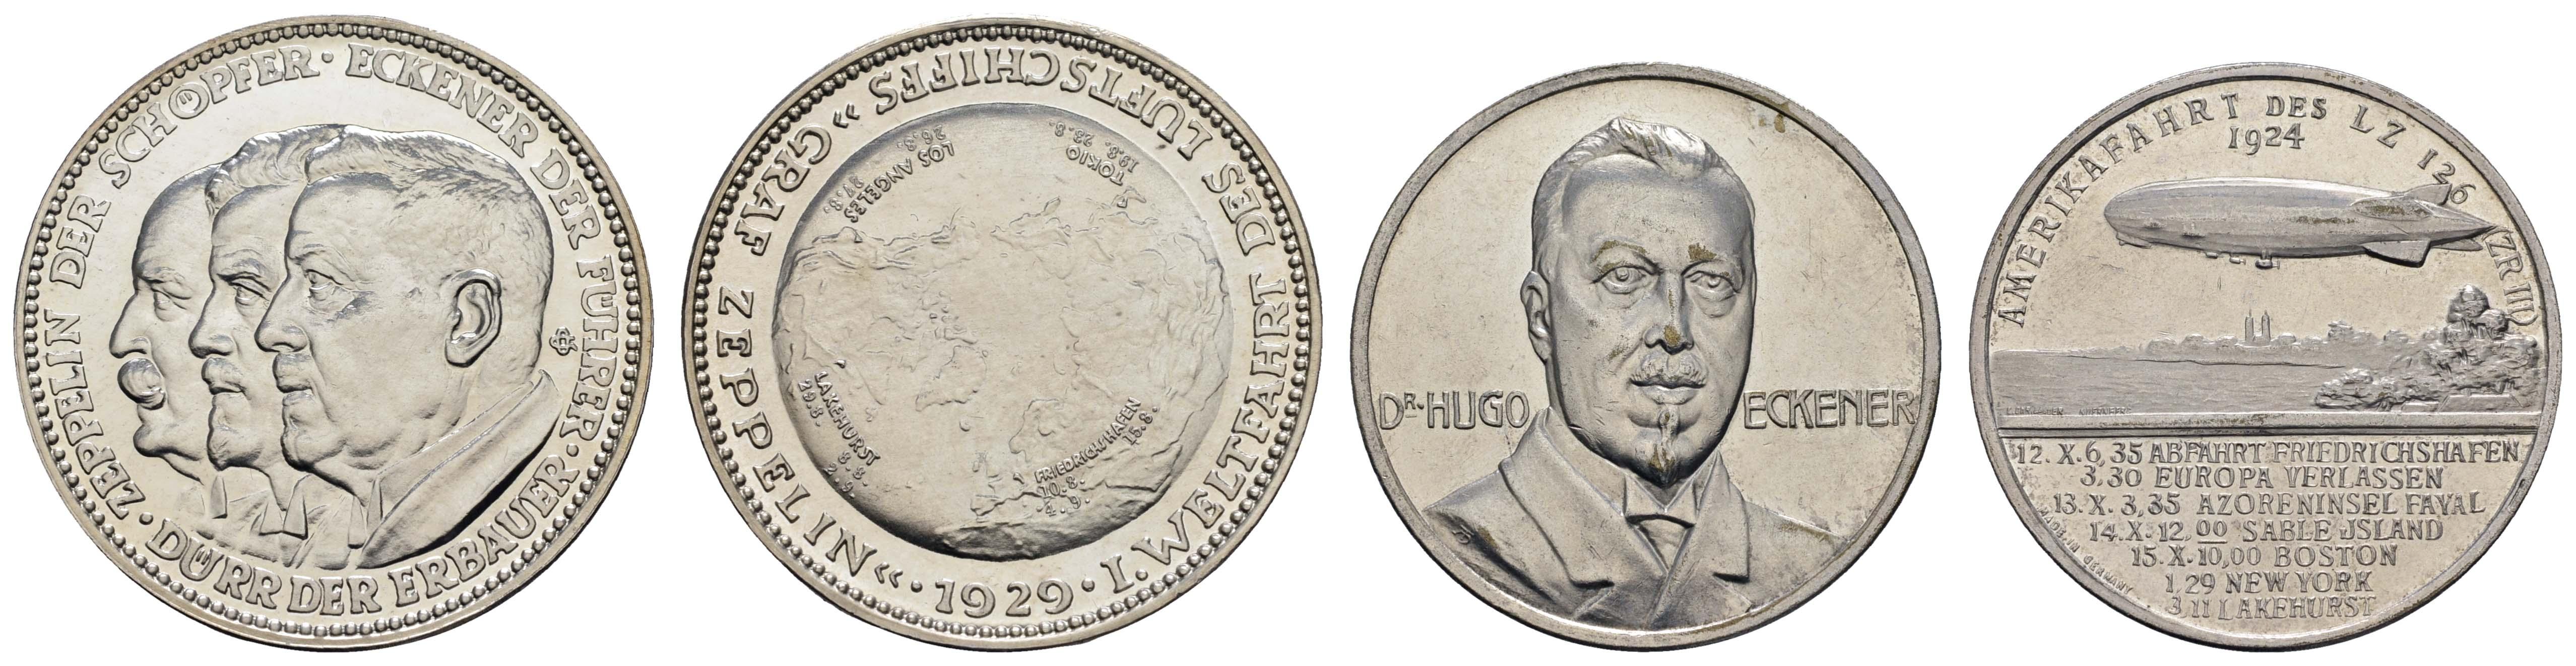 Lot 2325 - medaillen Sonstige Medaillen - Zeppelin -  Auktionshaus Ulrich Felzmann GmbH & Co. KG Coins single lots